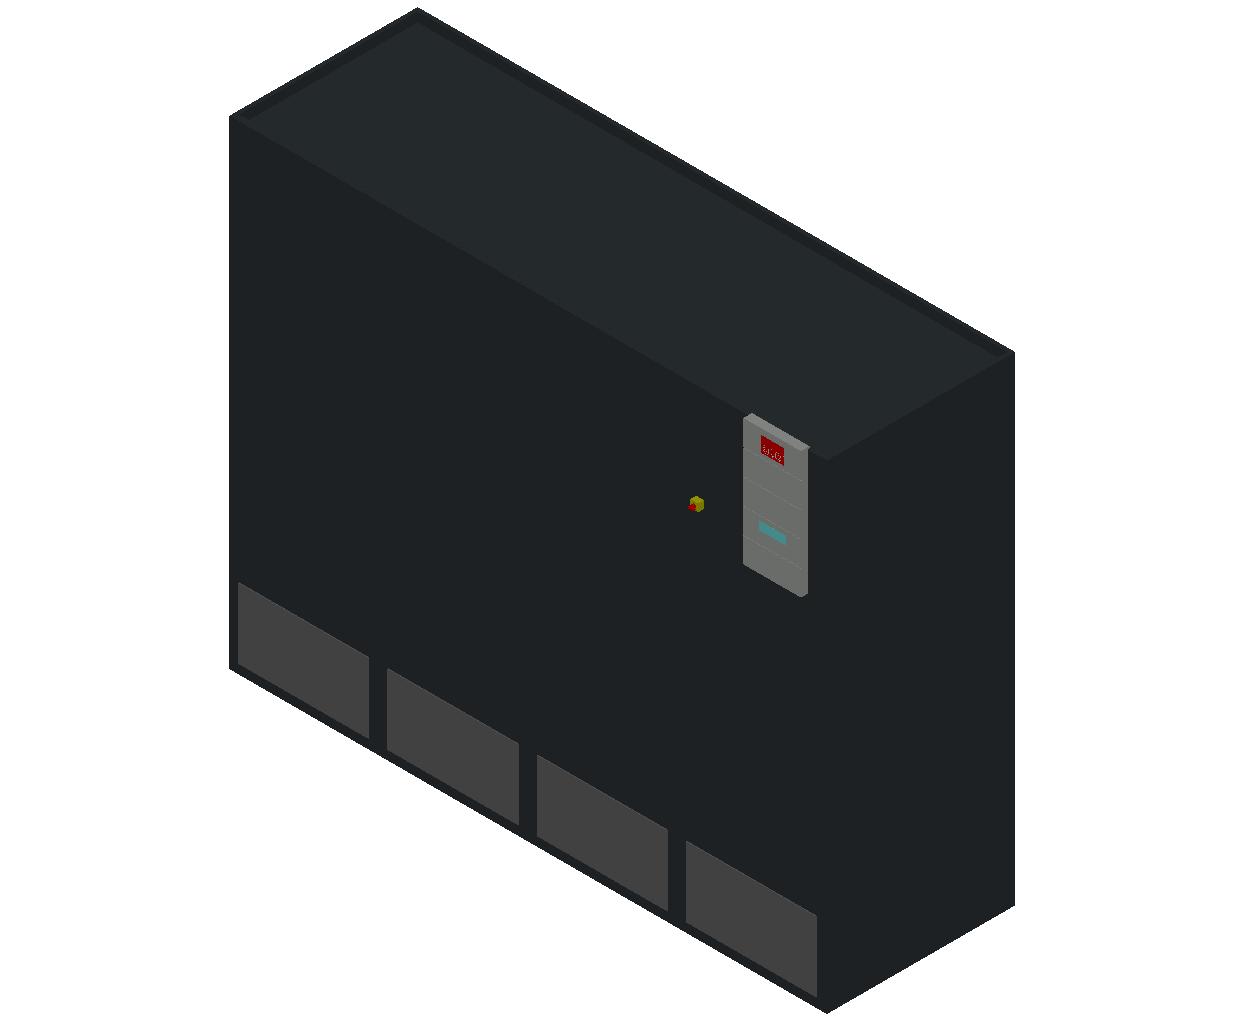 HC_Air Conditioner_Indoor Unit_MEPcontent_STULZ_CyberAir 3PRO_ASR_CW_ASR_2060_CW_INT-EN.dwg